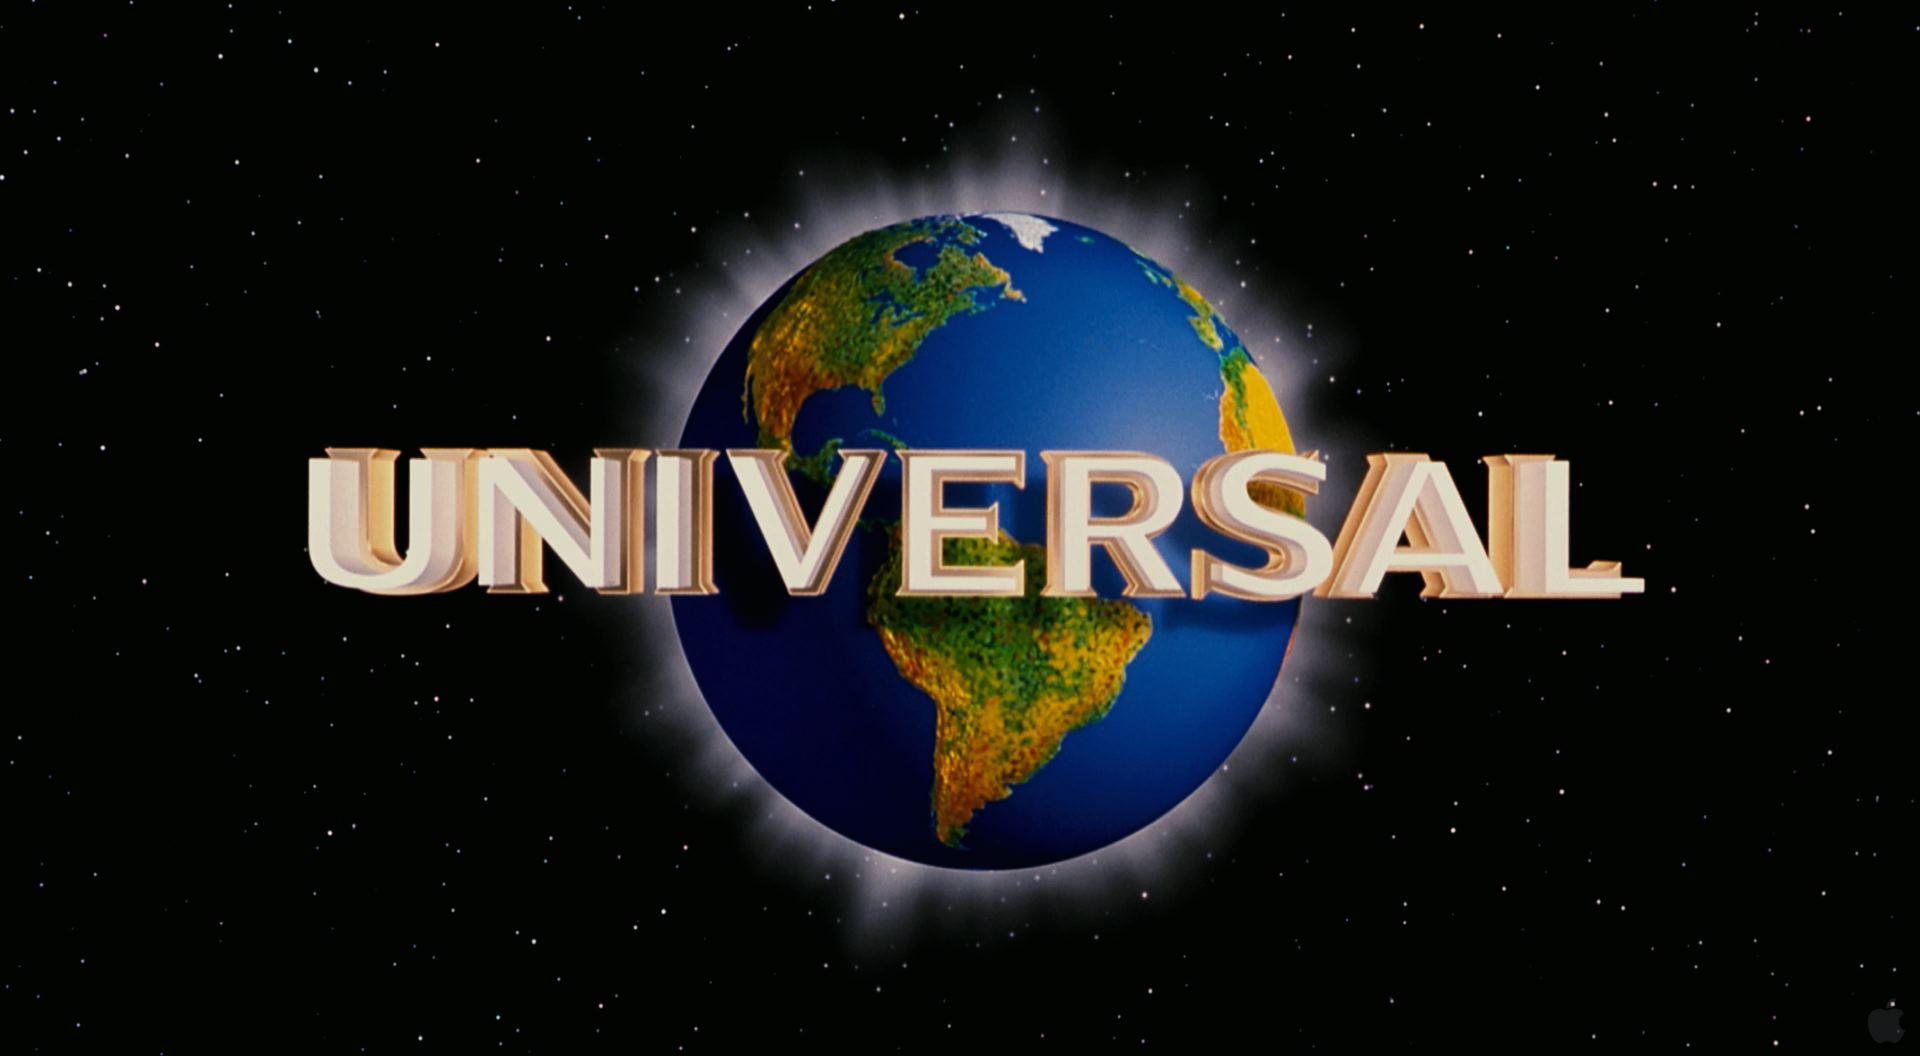 Dernieres Hollywood Movie Wallpapers Hd universal studios logo 1920x1056